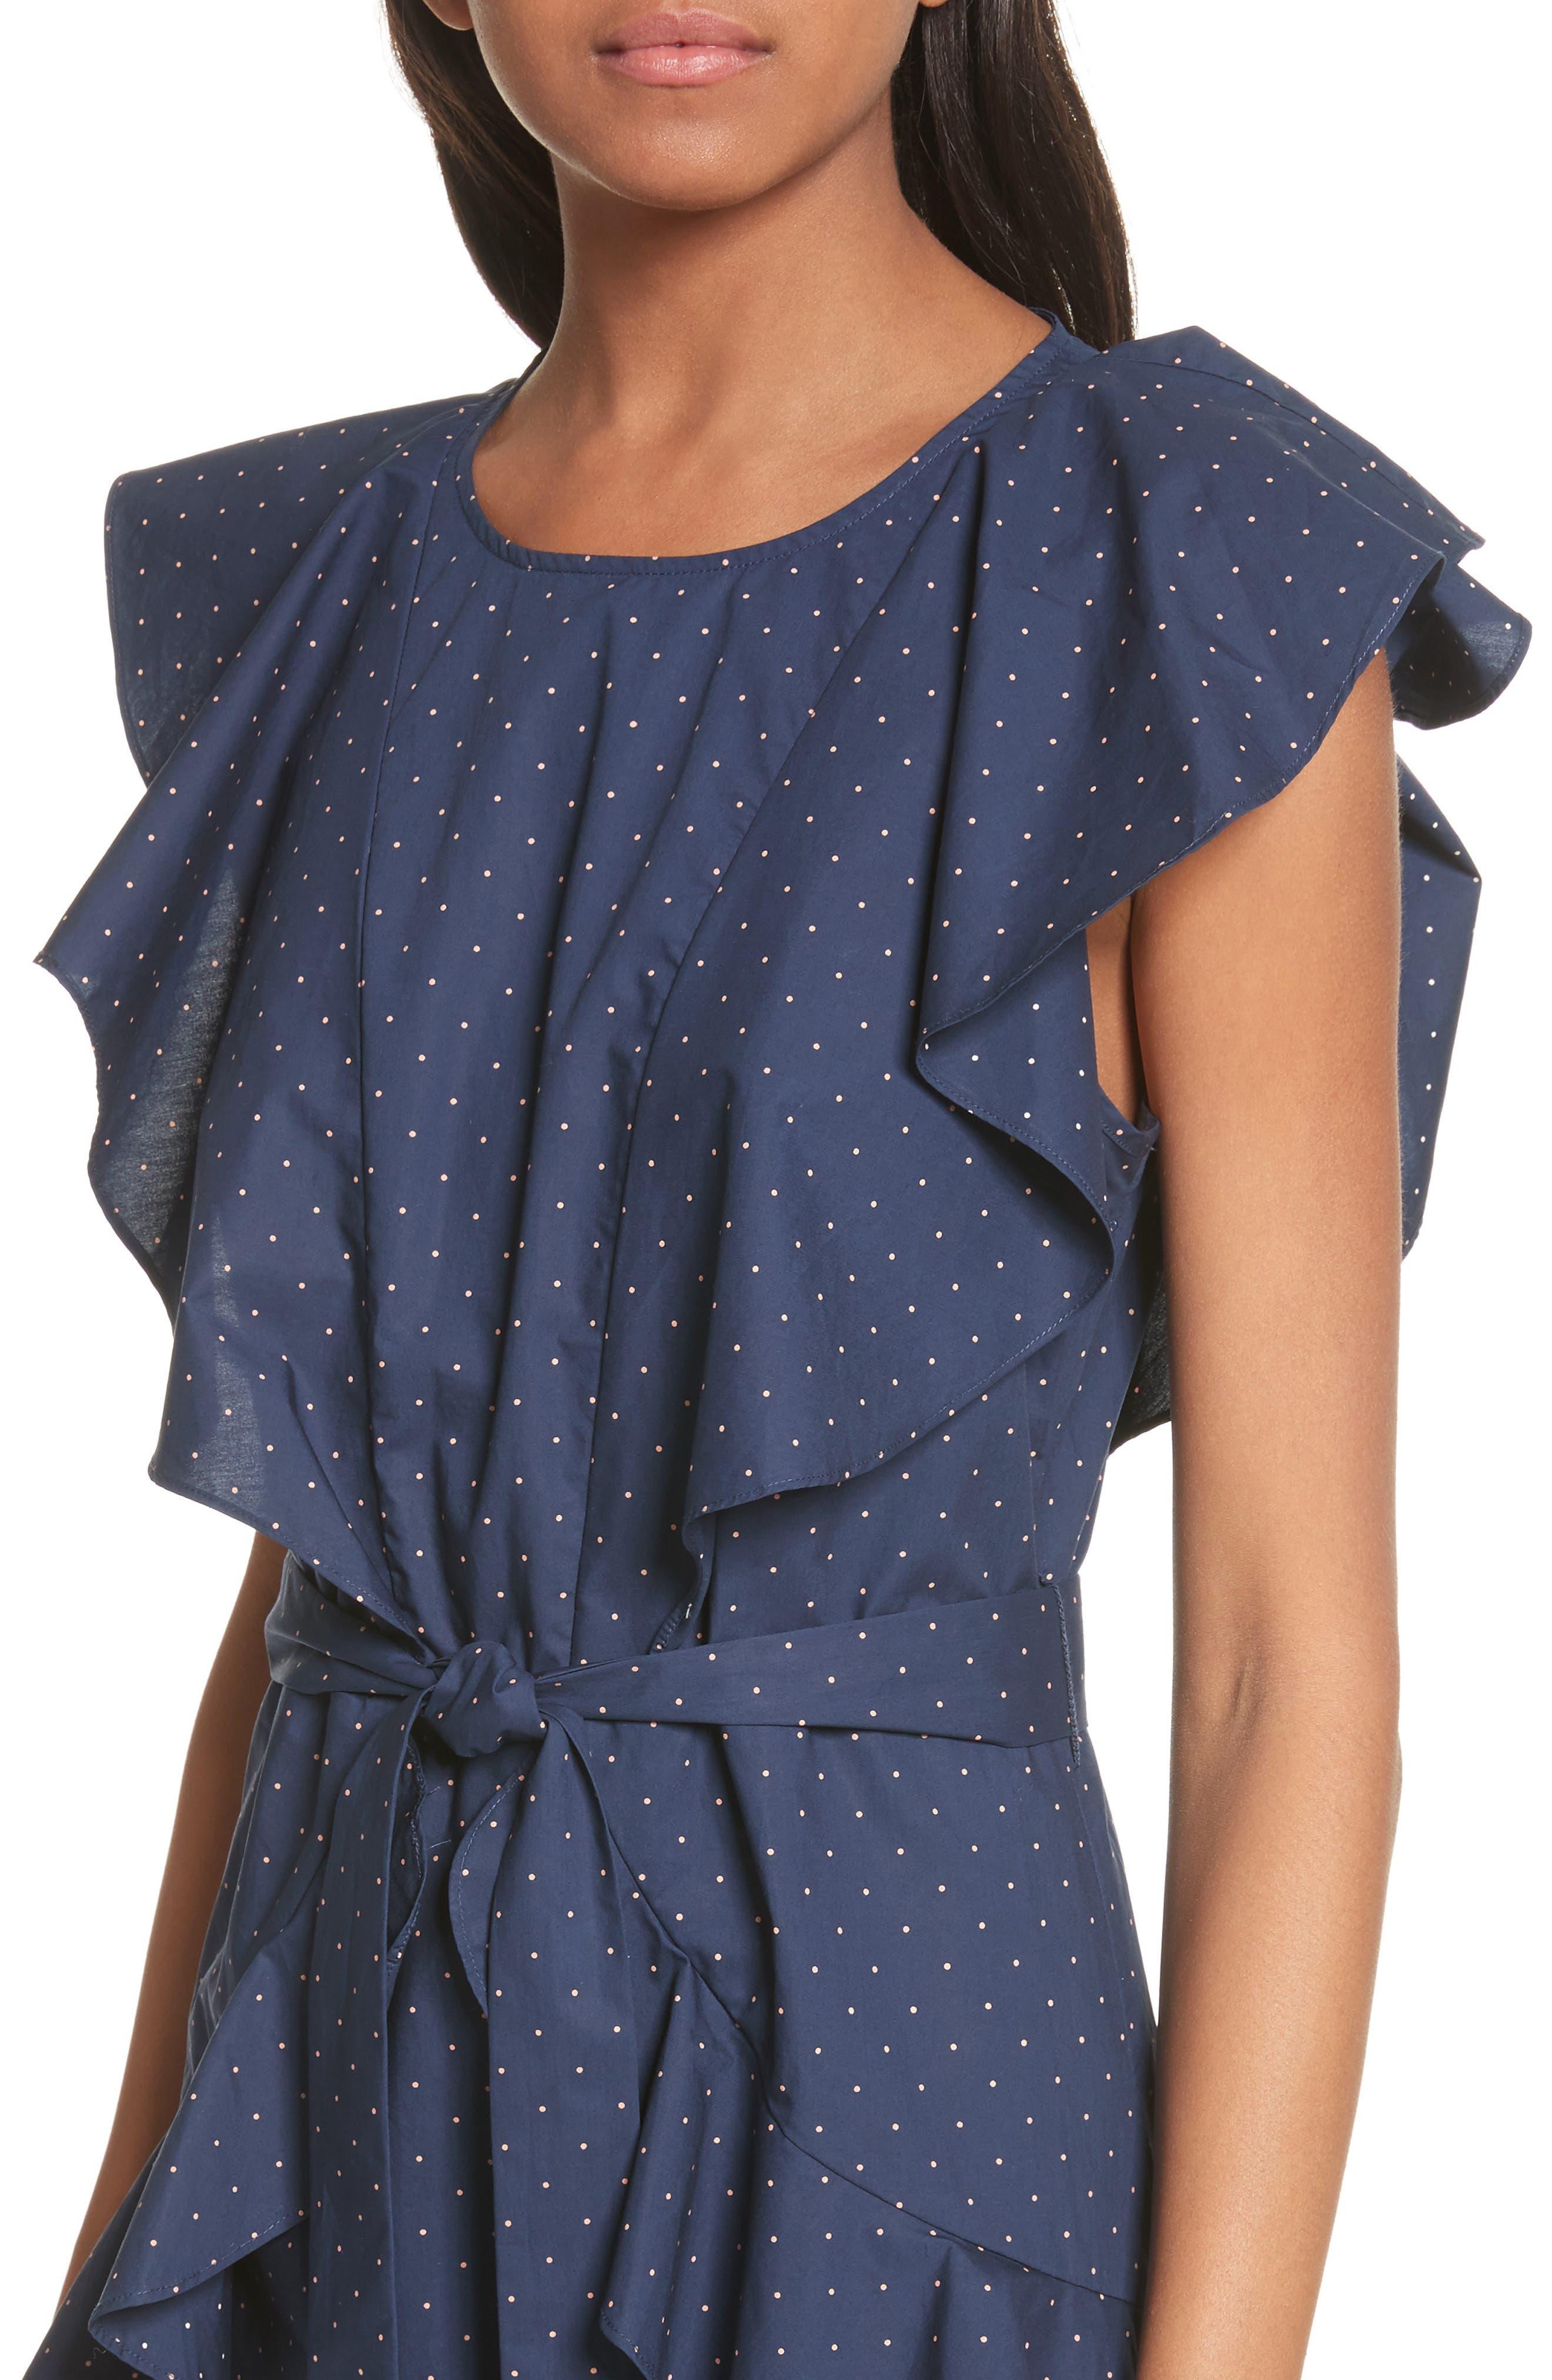 Malachy Ruffle Dot Cotton Dress,                             Alternate thumbnail 4, color,